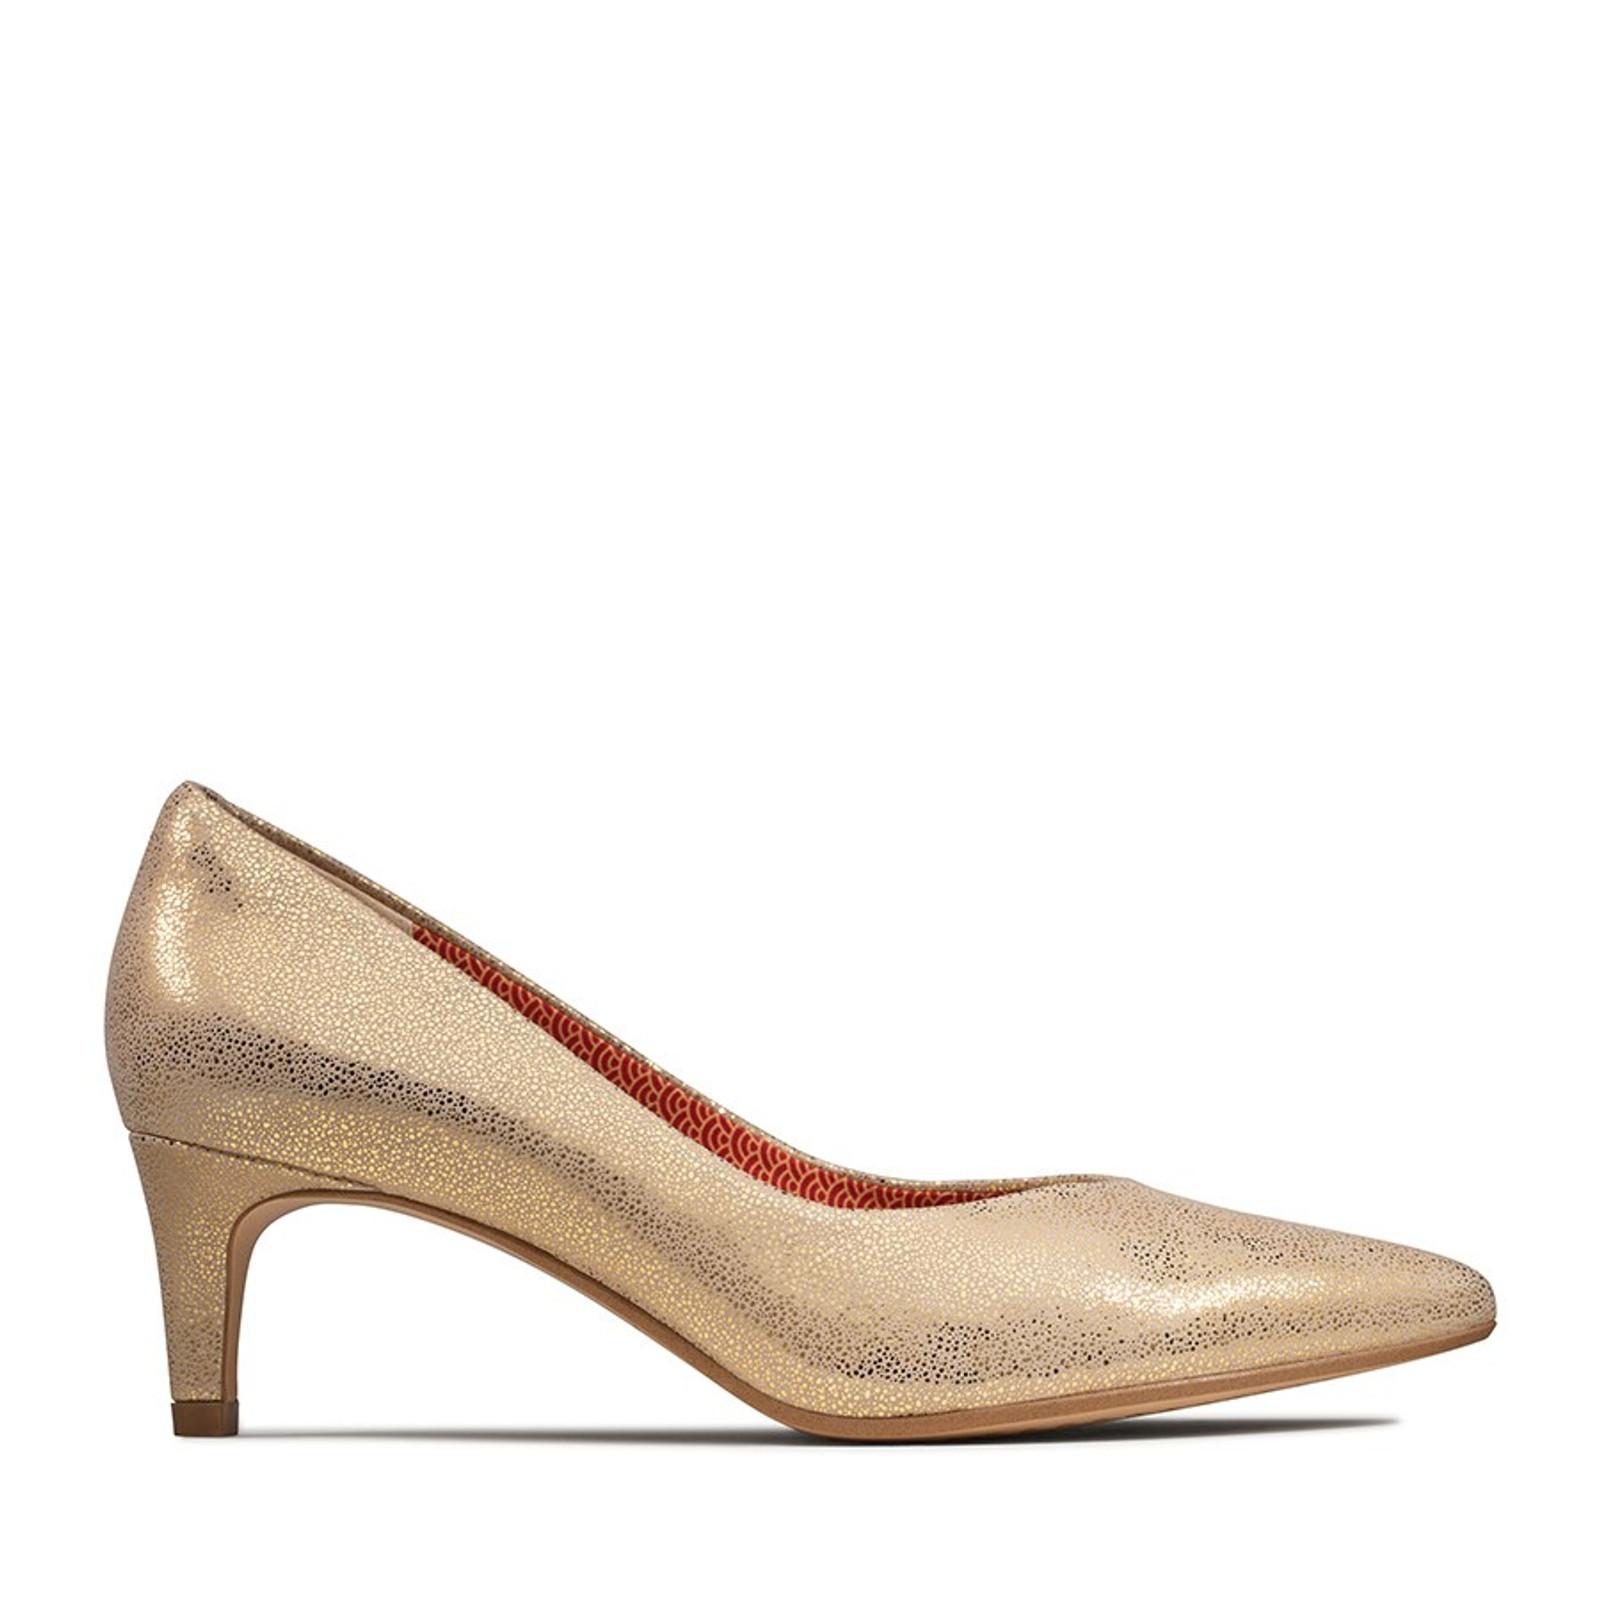 Clarks Womens LAINA55 COURT Gold Metallic